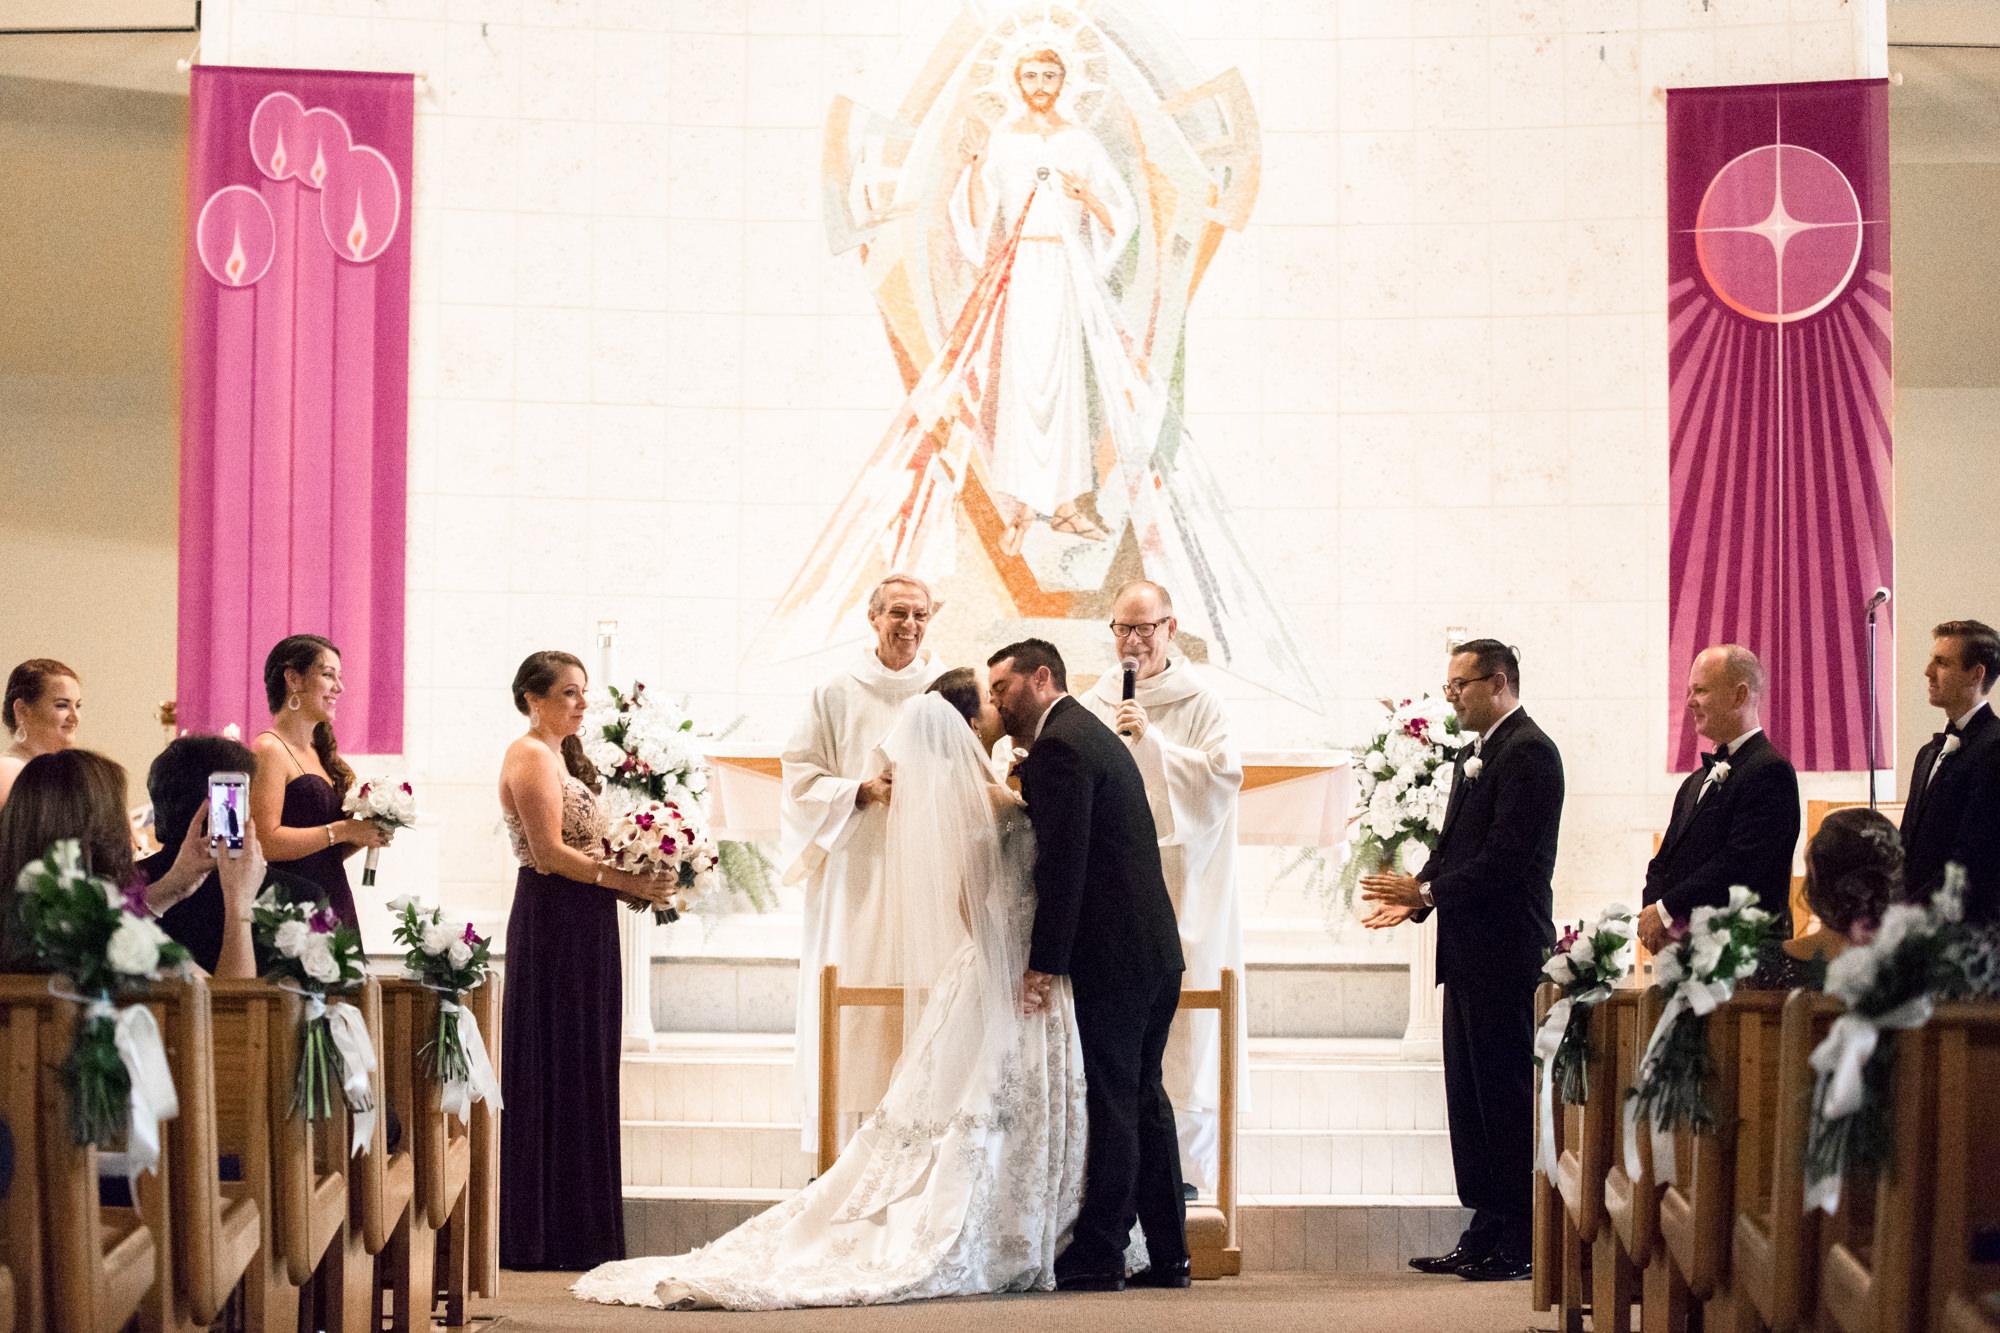 Benvenuto_Wedding_catholic_Florida_Bride-Groom-51.jpg